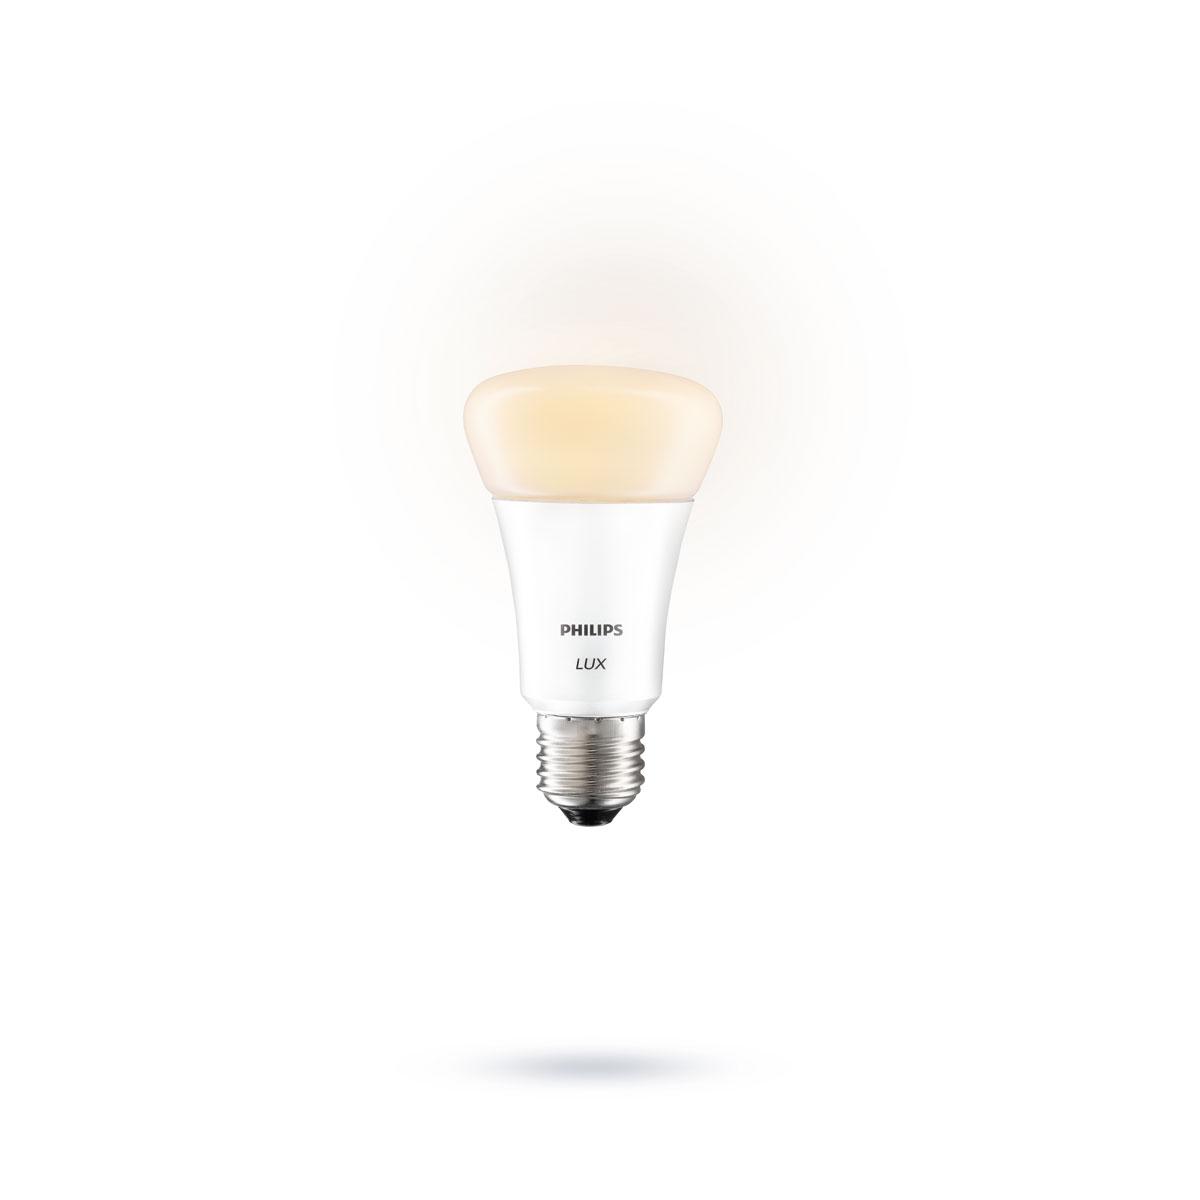 philips hue lux starterset 2 lampen met bridge. Black Bedroom Furniture Sets. Home Design Ideas